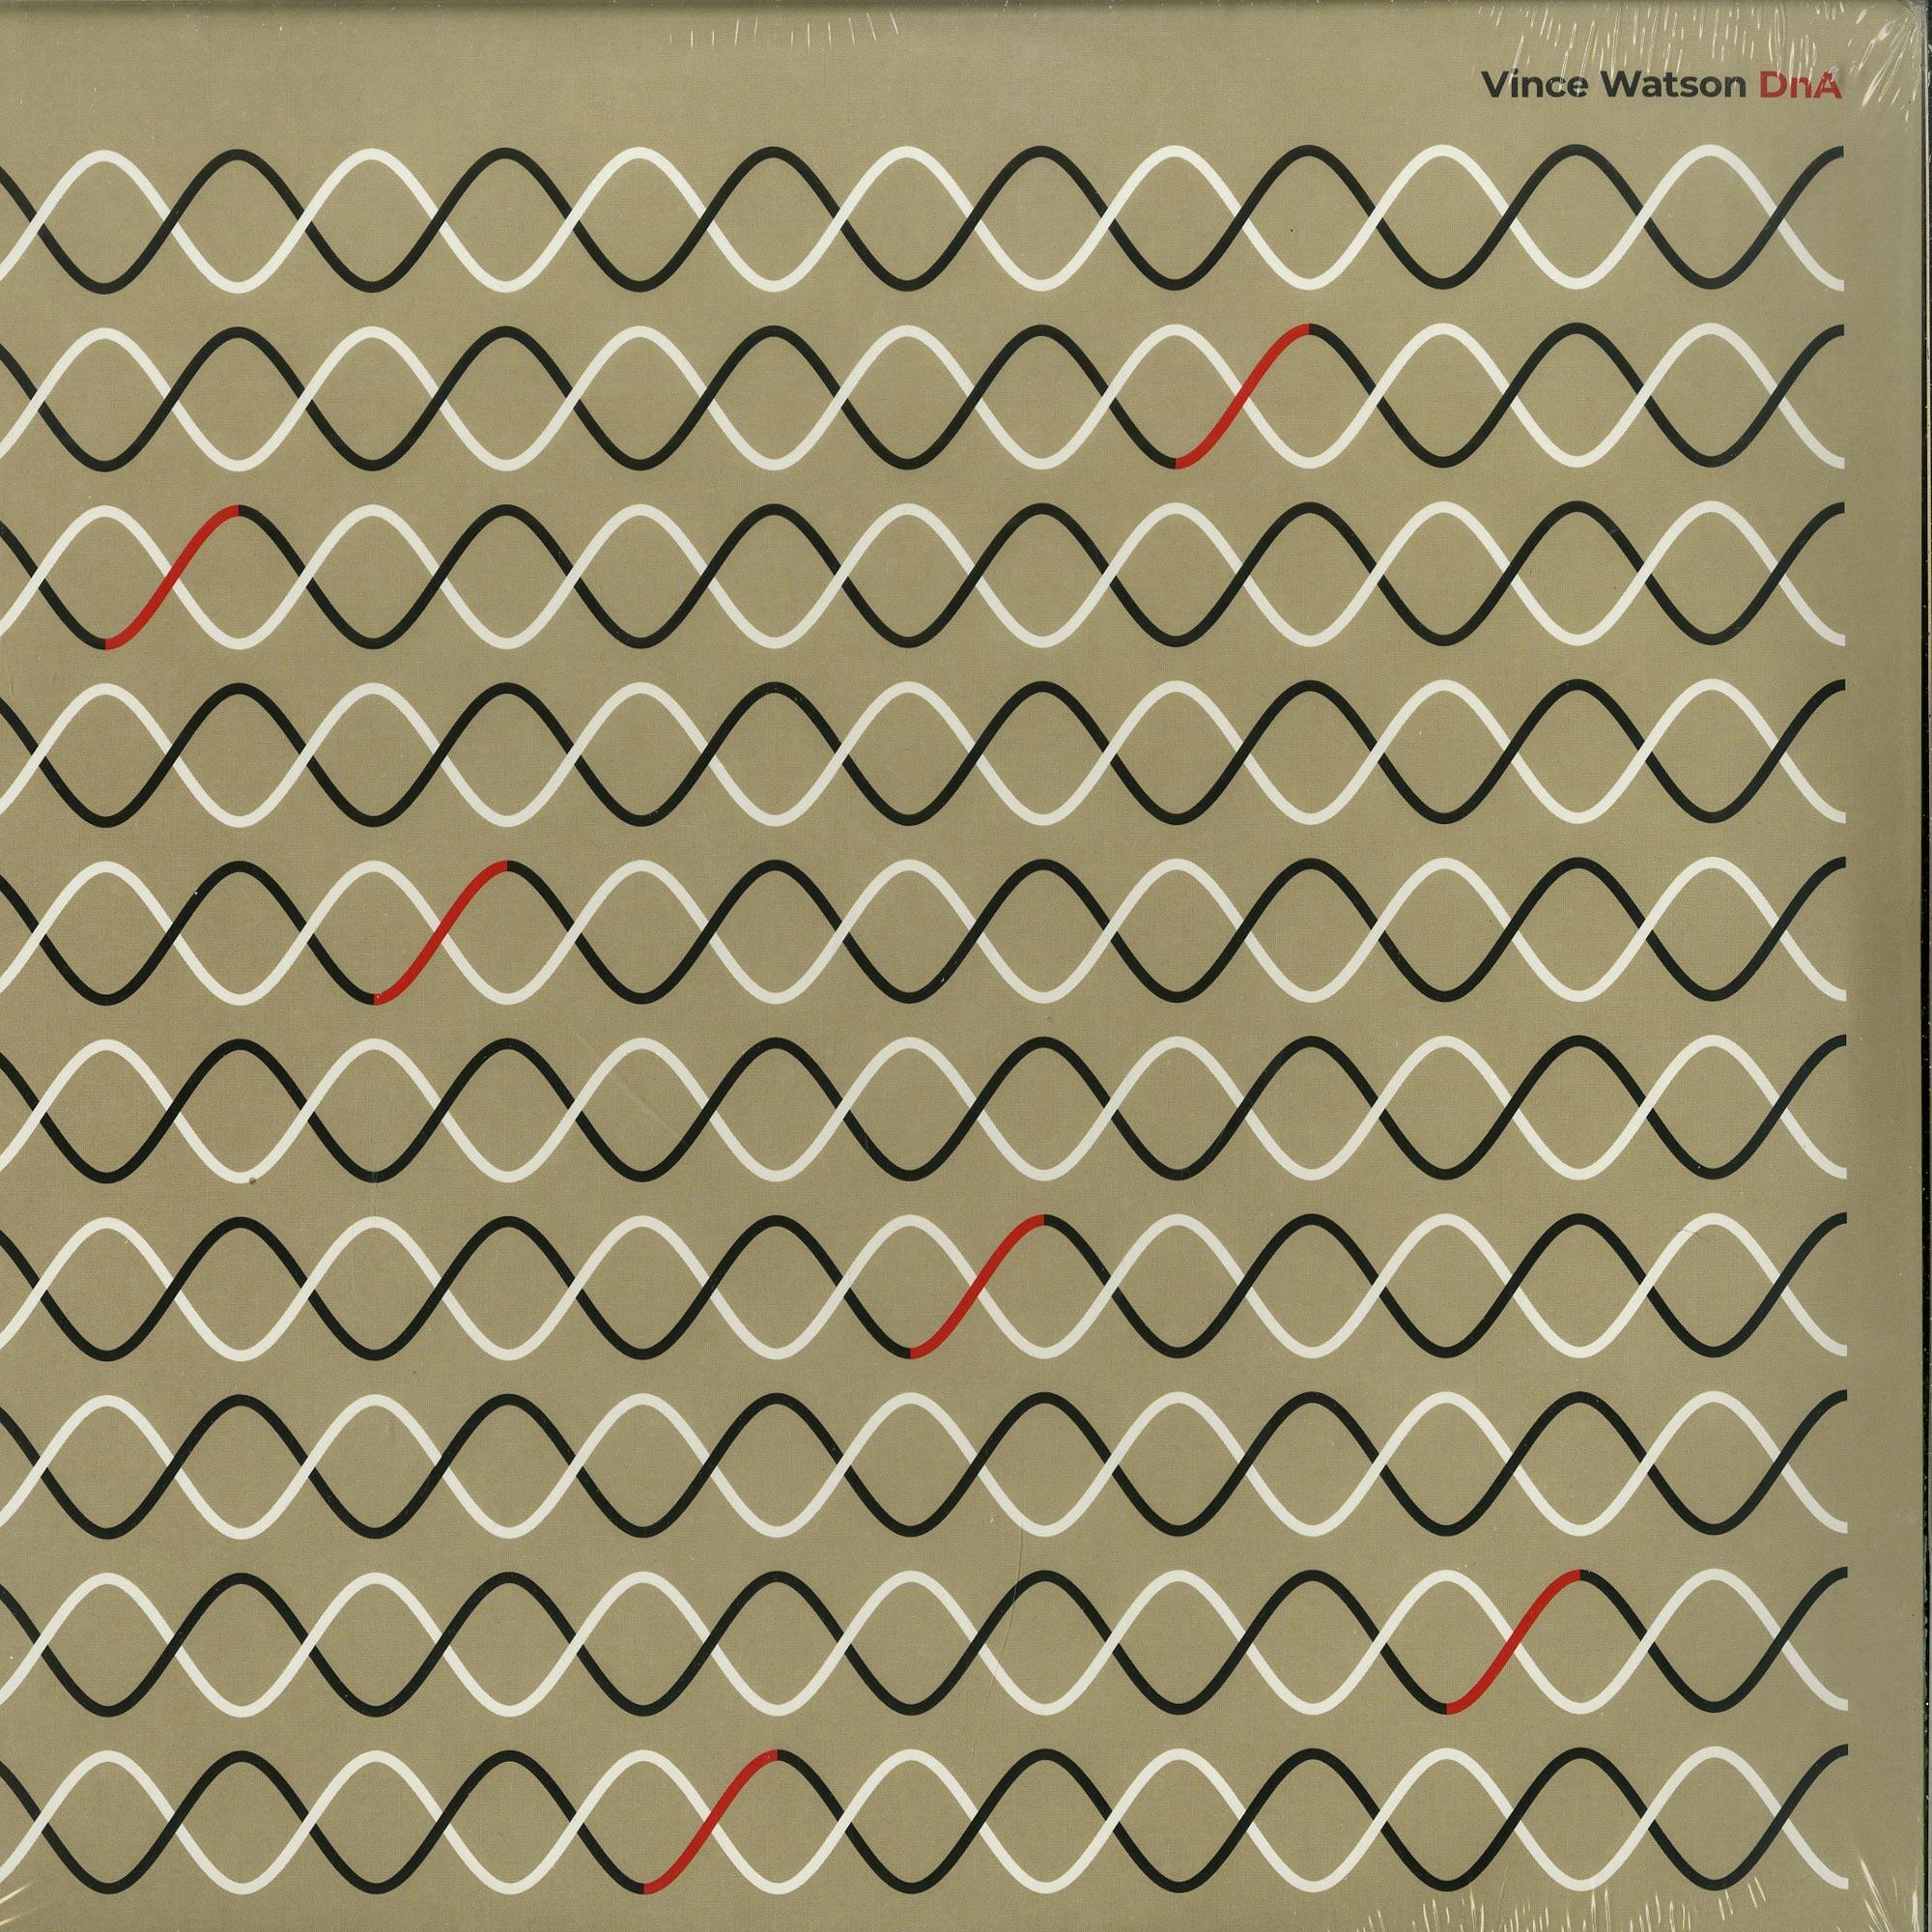 Vince Watson - DNA - LP